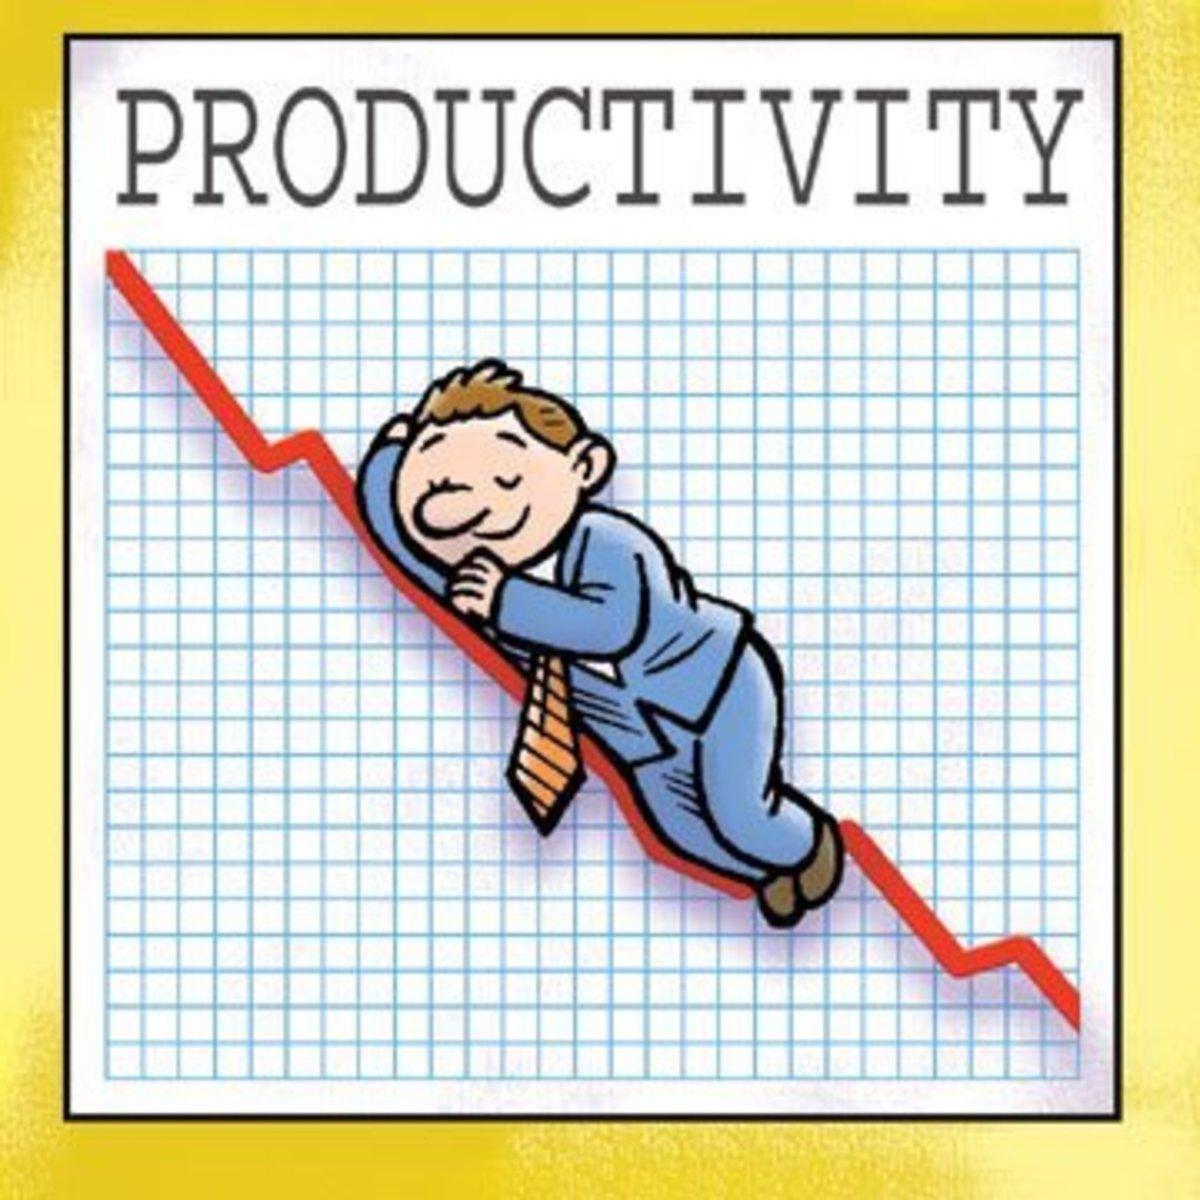 http://lemmyc.hubpages.com/hub/howtoimproveyourproductivity